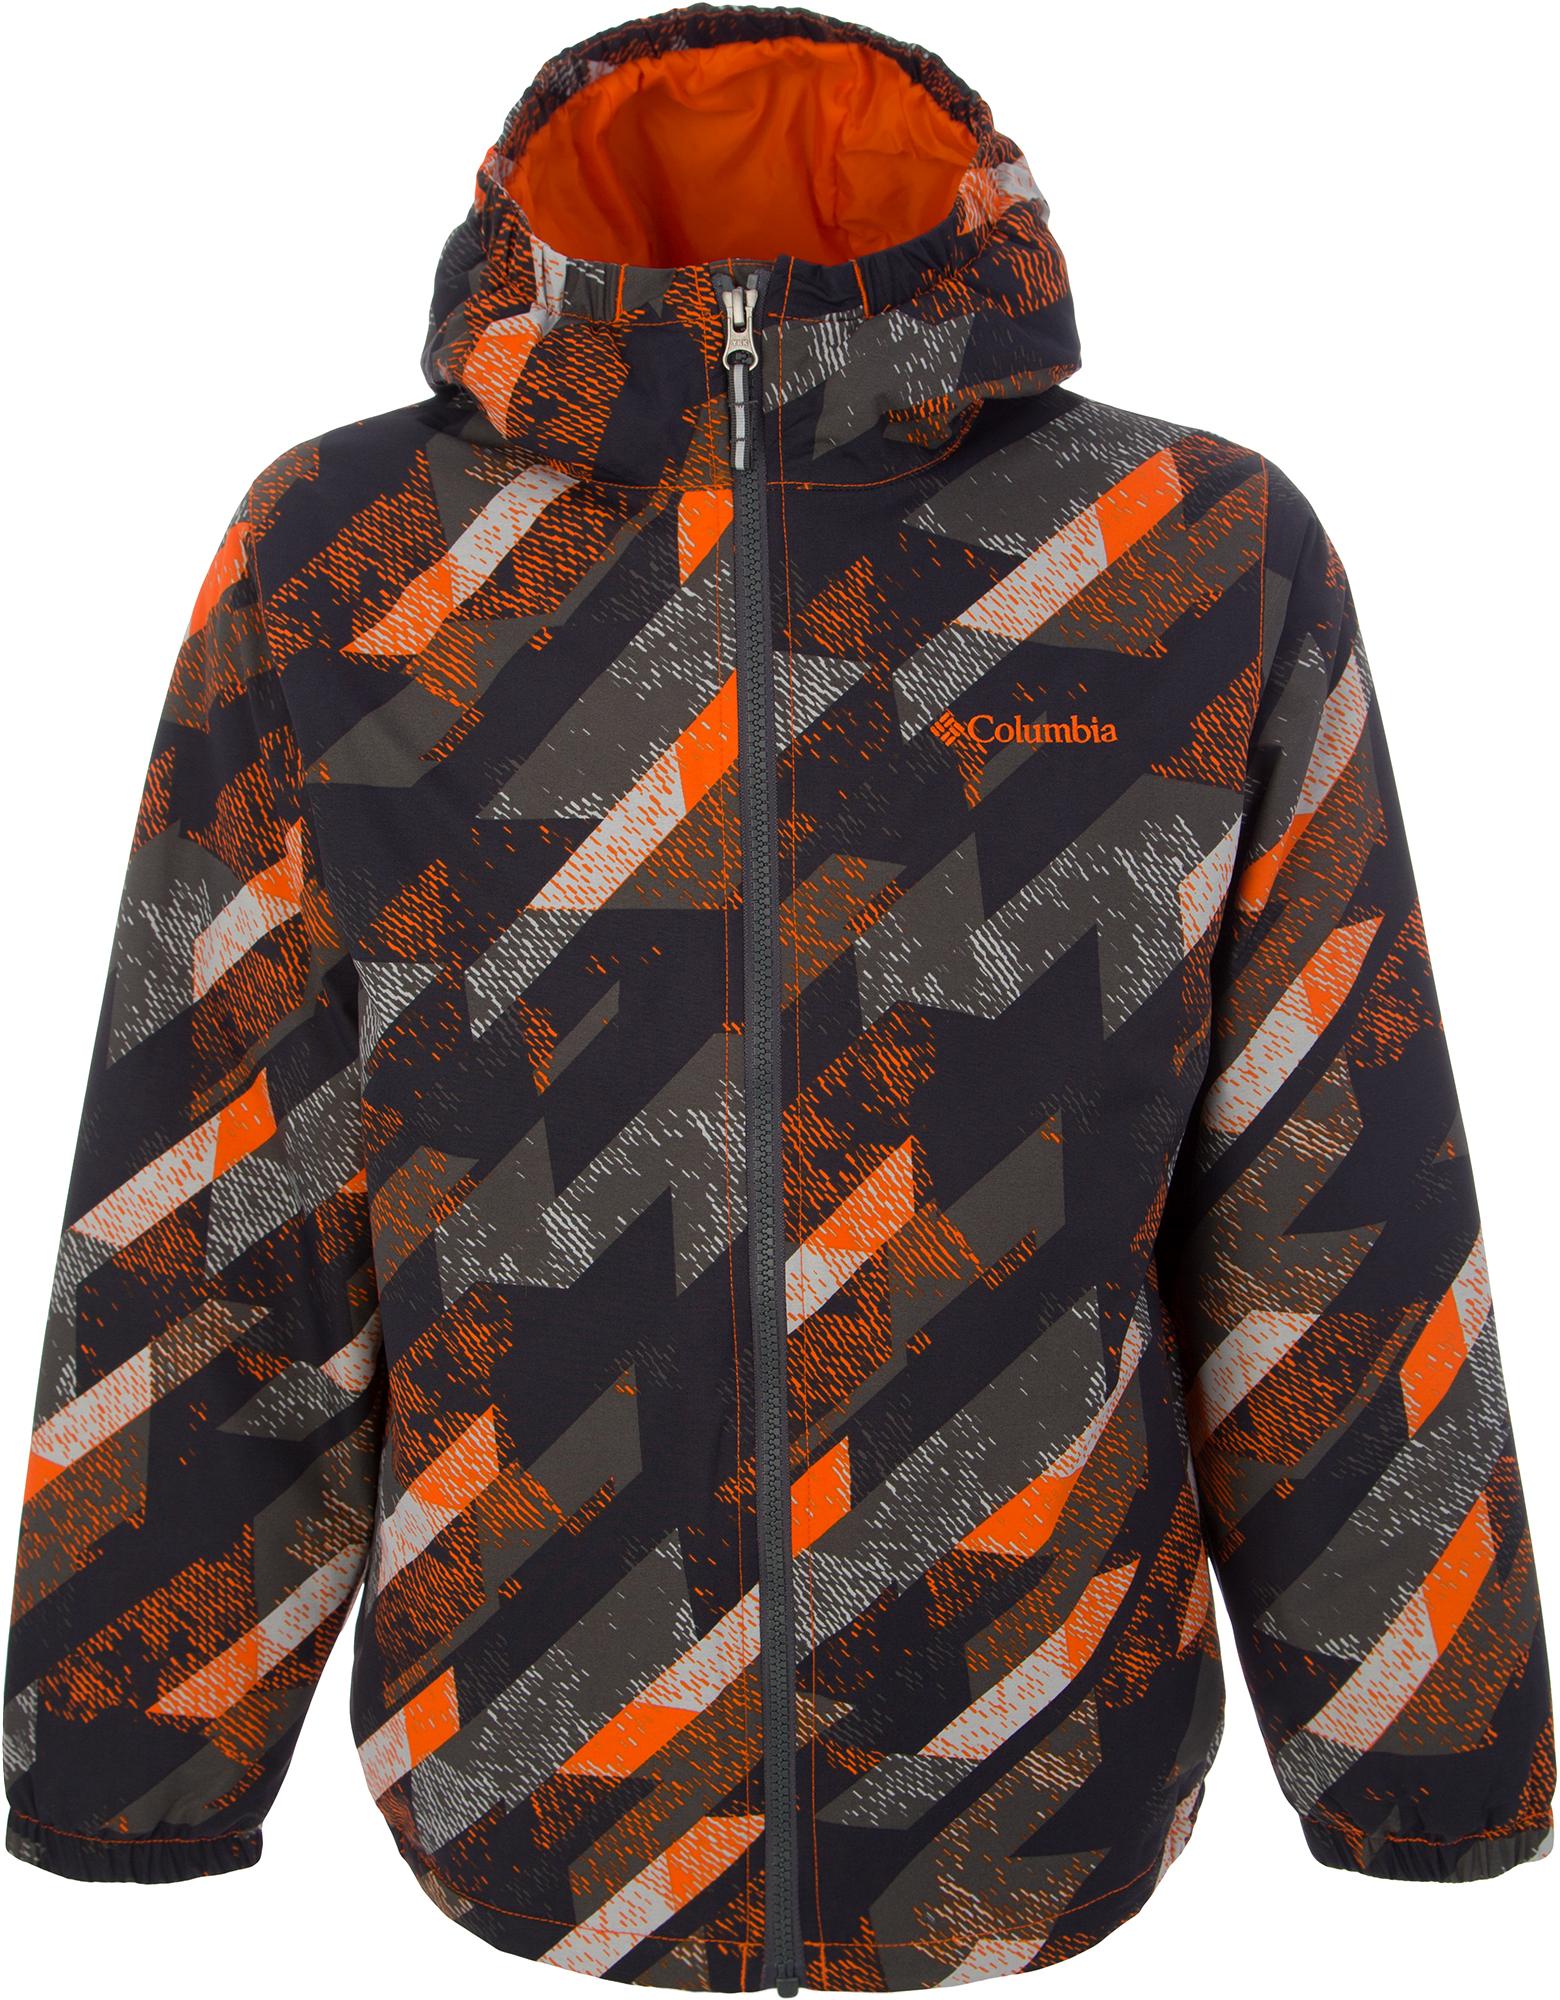 Columbia Куртка утепленная для мальчиков Columbia Meander Meadow, размер 160-170